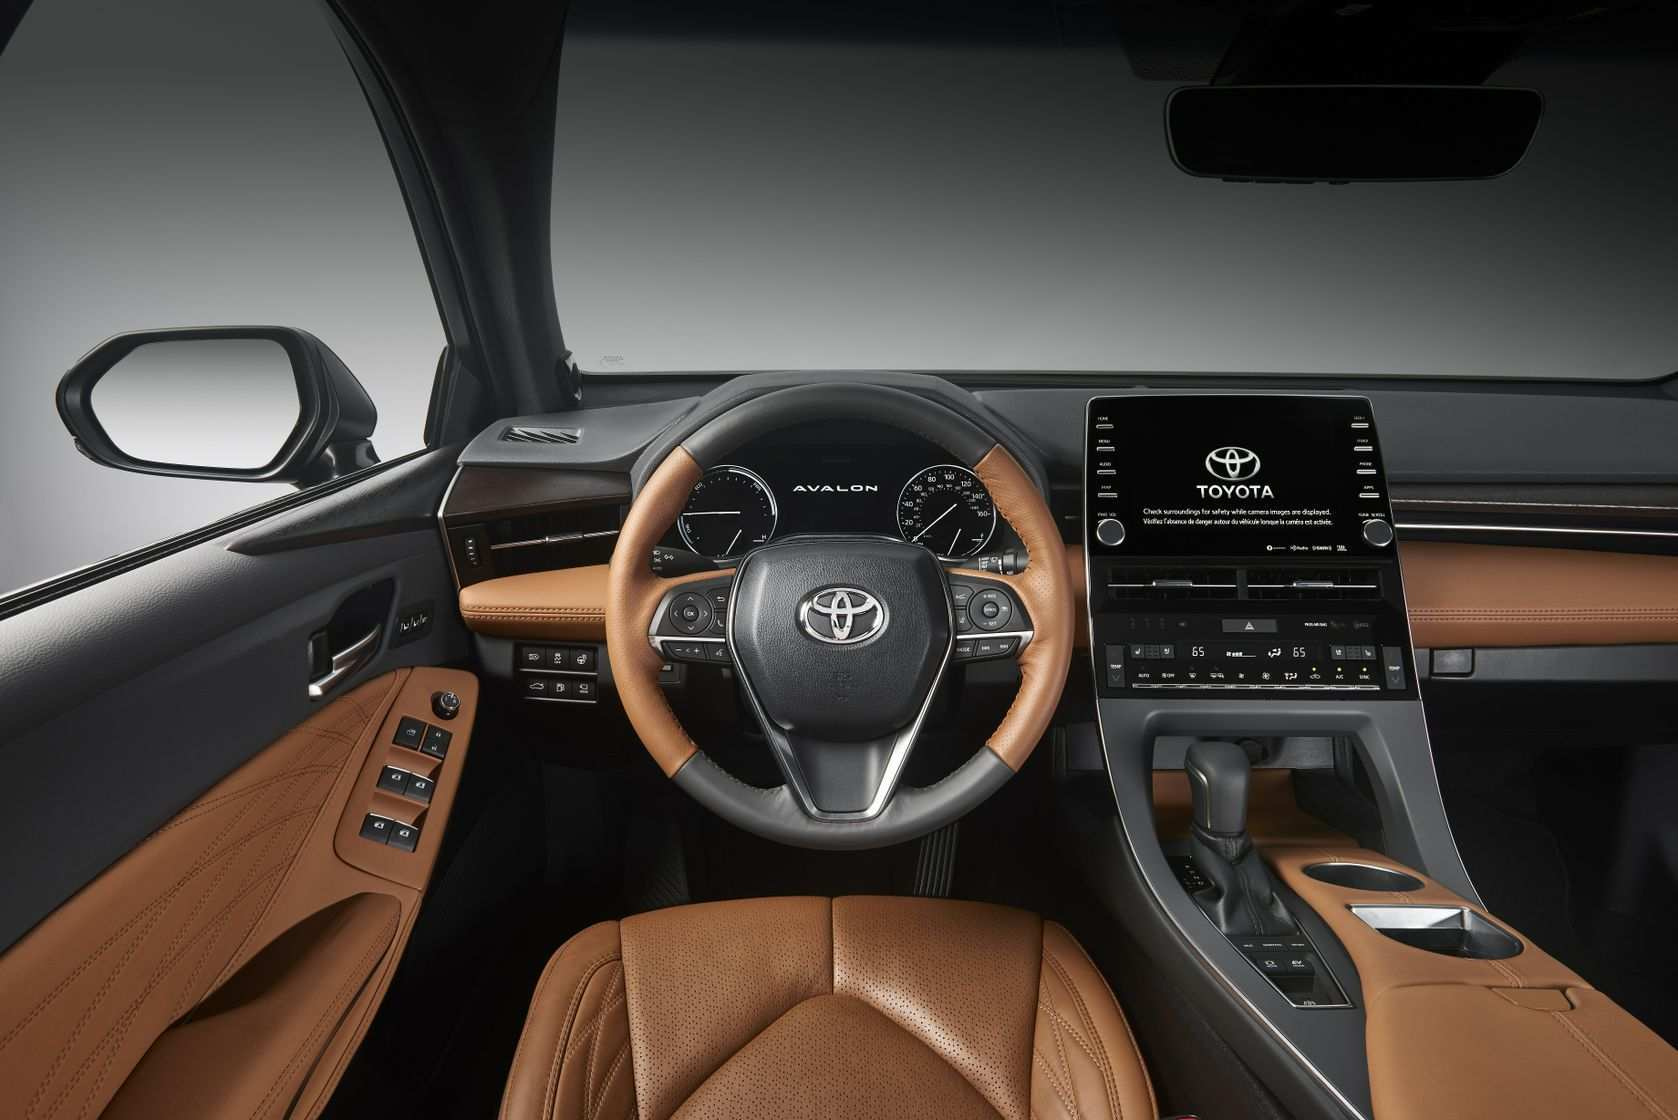 25 Concept of Best Avalon Toyota 2019 Interior Concept Engine by Best Avalon Toyota 2019 Interior Concept